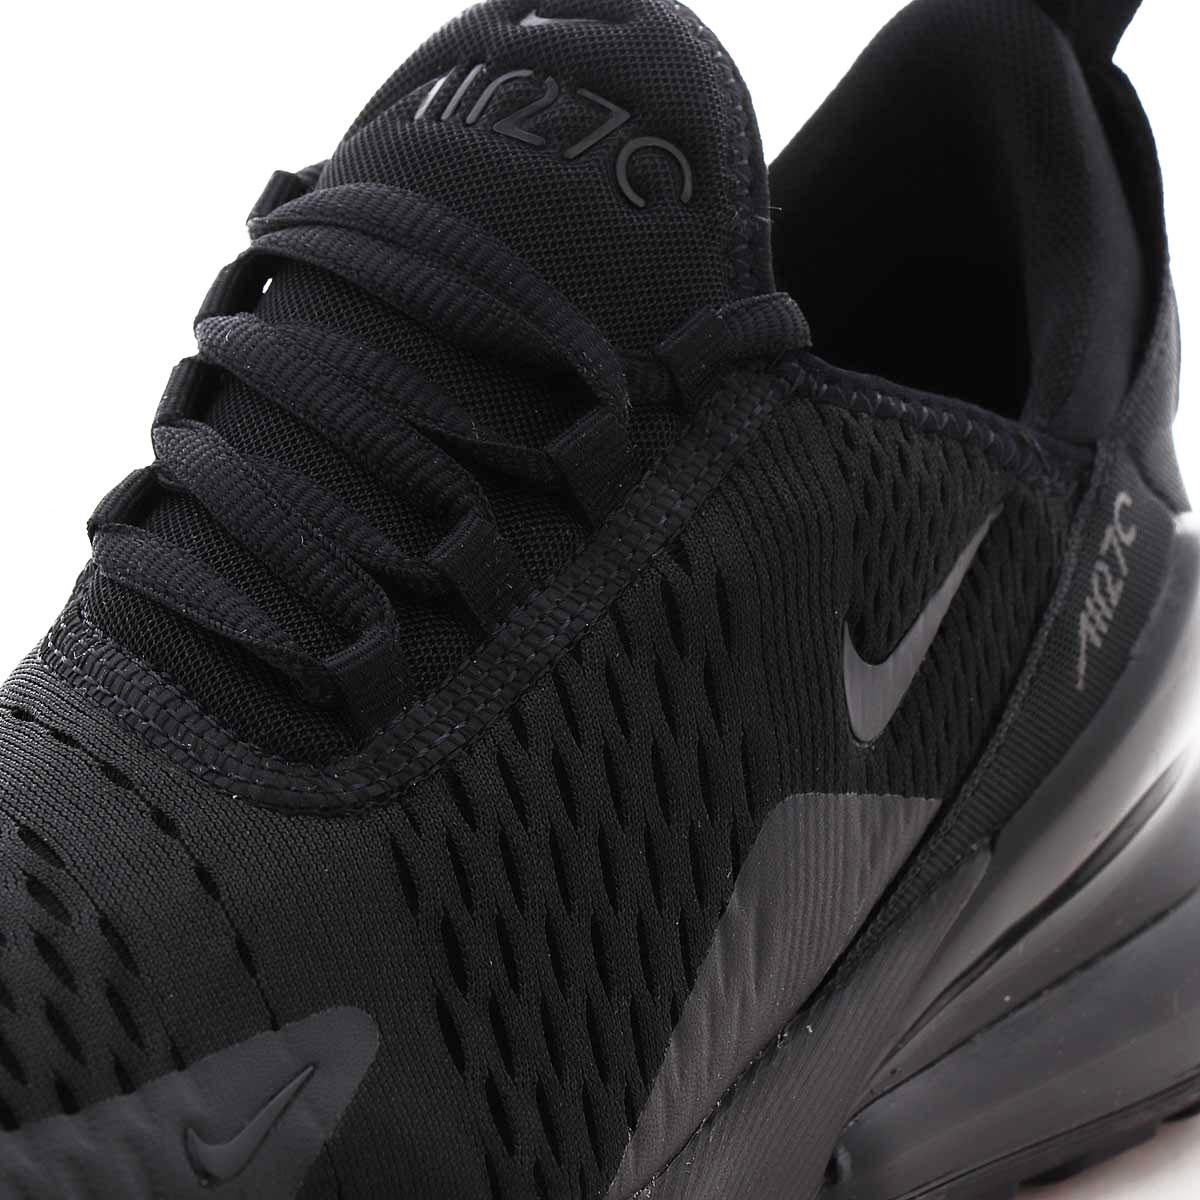 Nike Air Max 270 BG Kinder Sneaker schwarz BQ5776 001